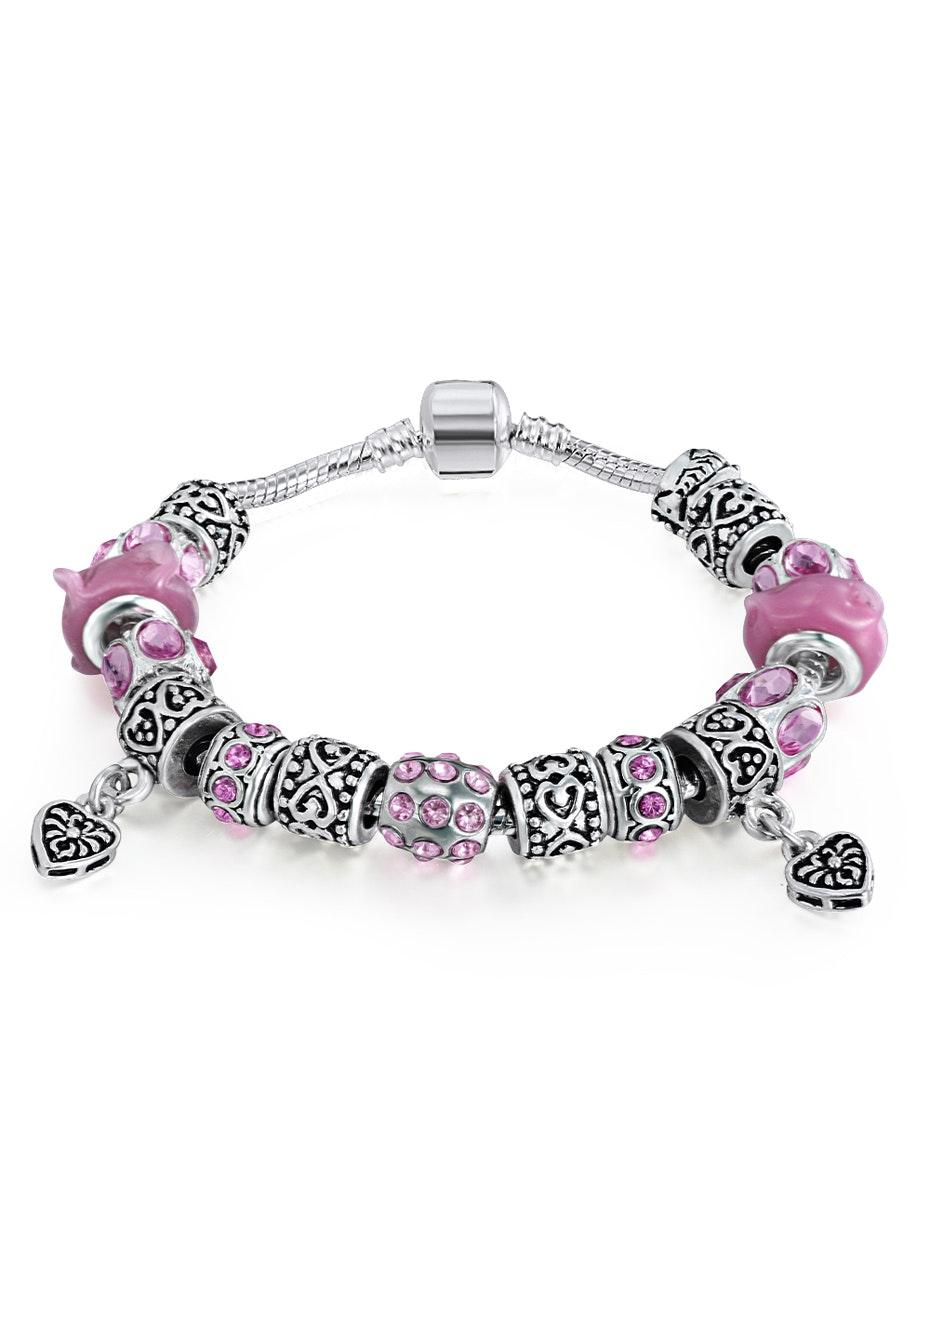 Lampwork designer bracelet